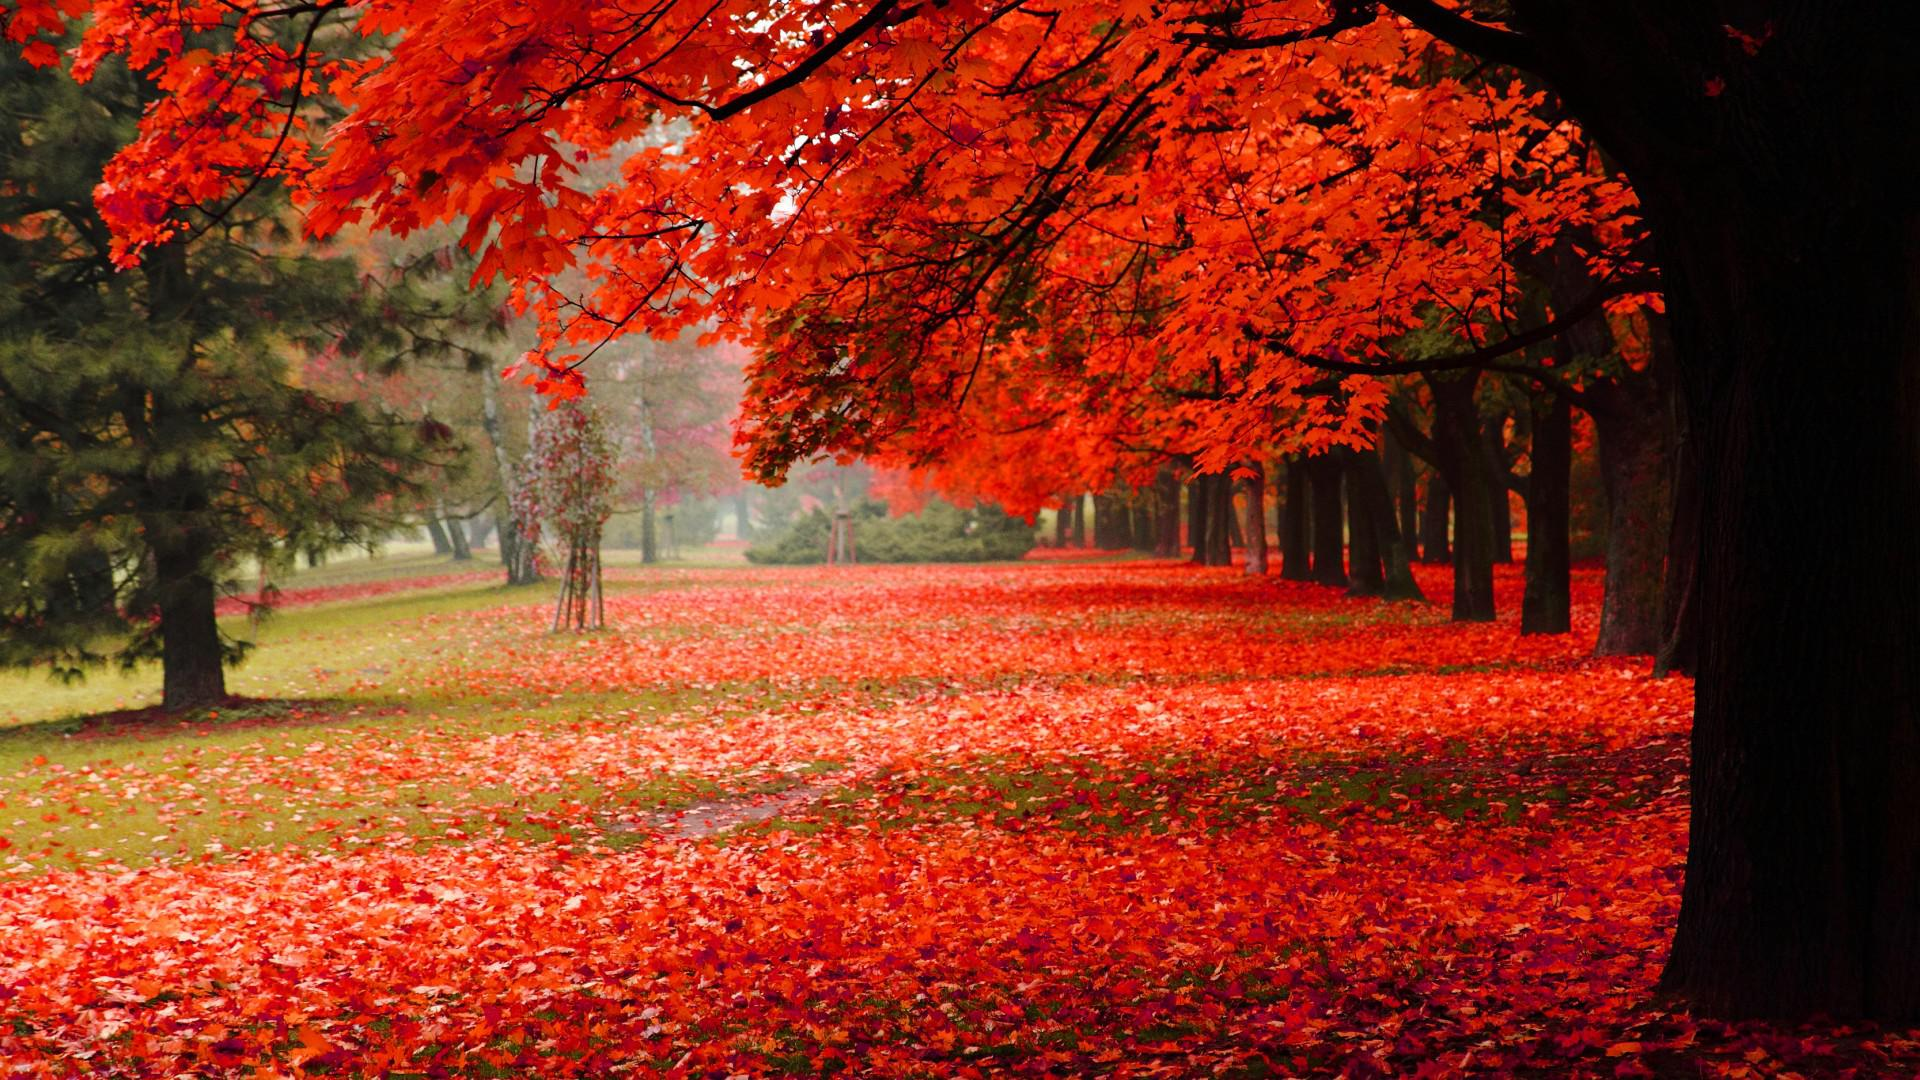 Hd scenery - Love nature wallpaper hd ...